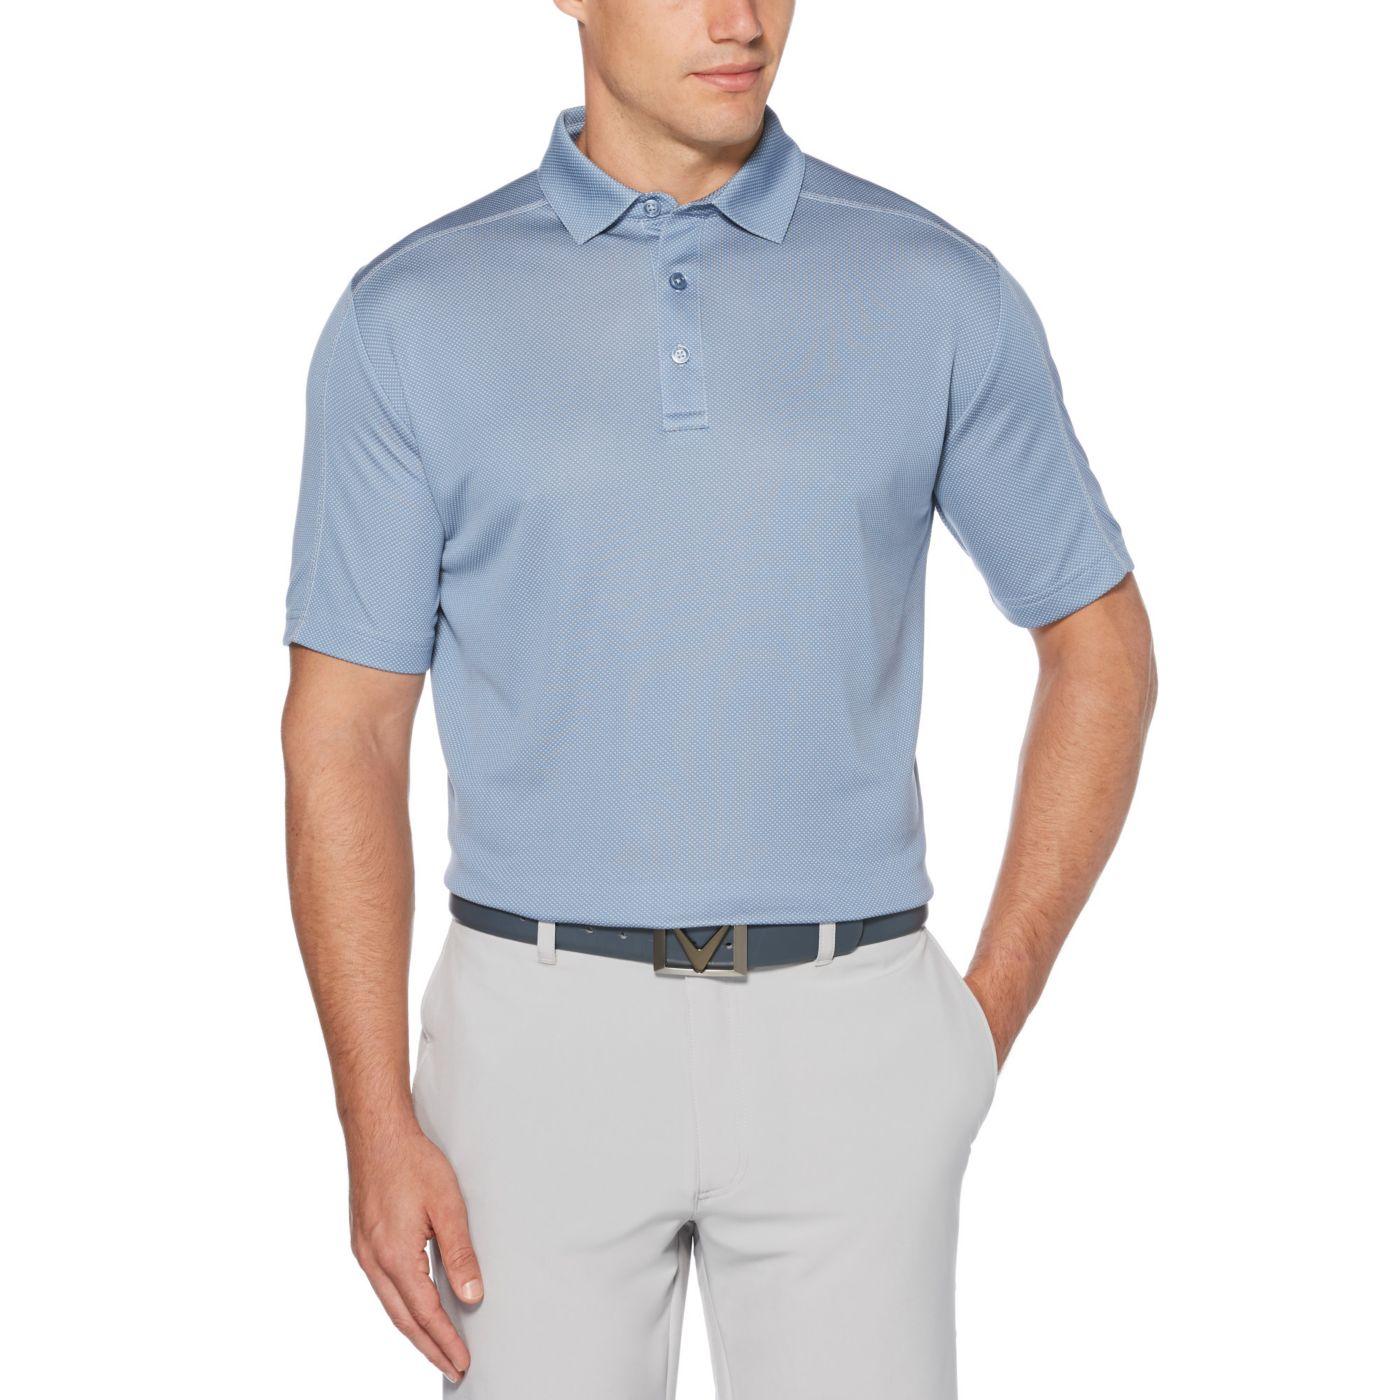 Callaway Men's Refined Jacquard Golf Polo - Big & Tall